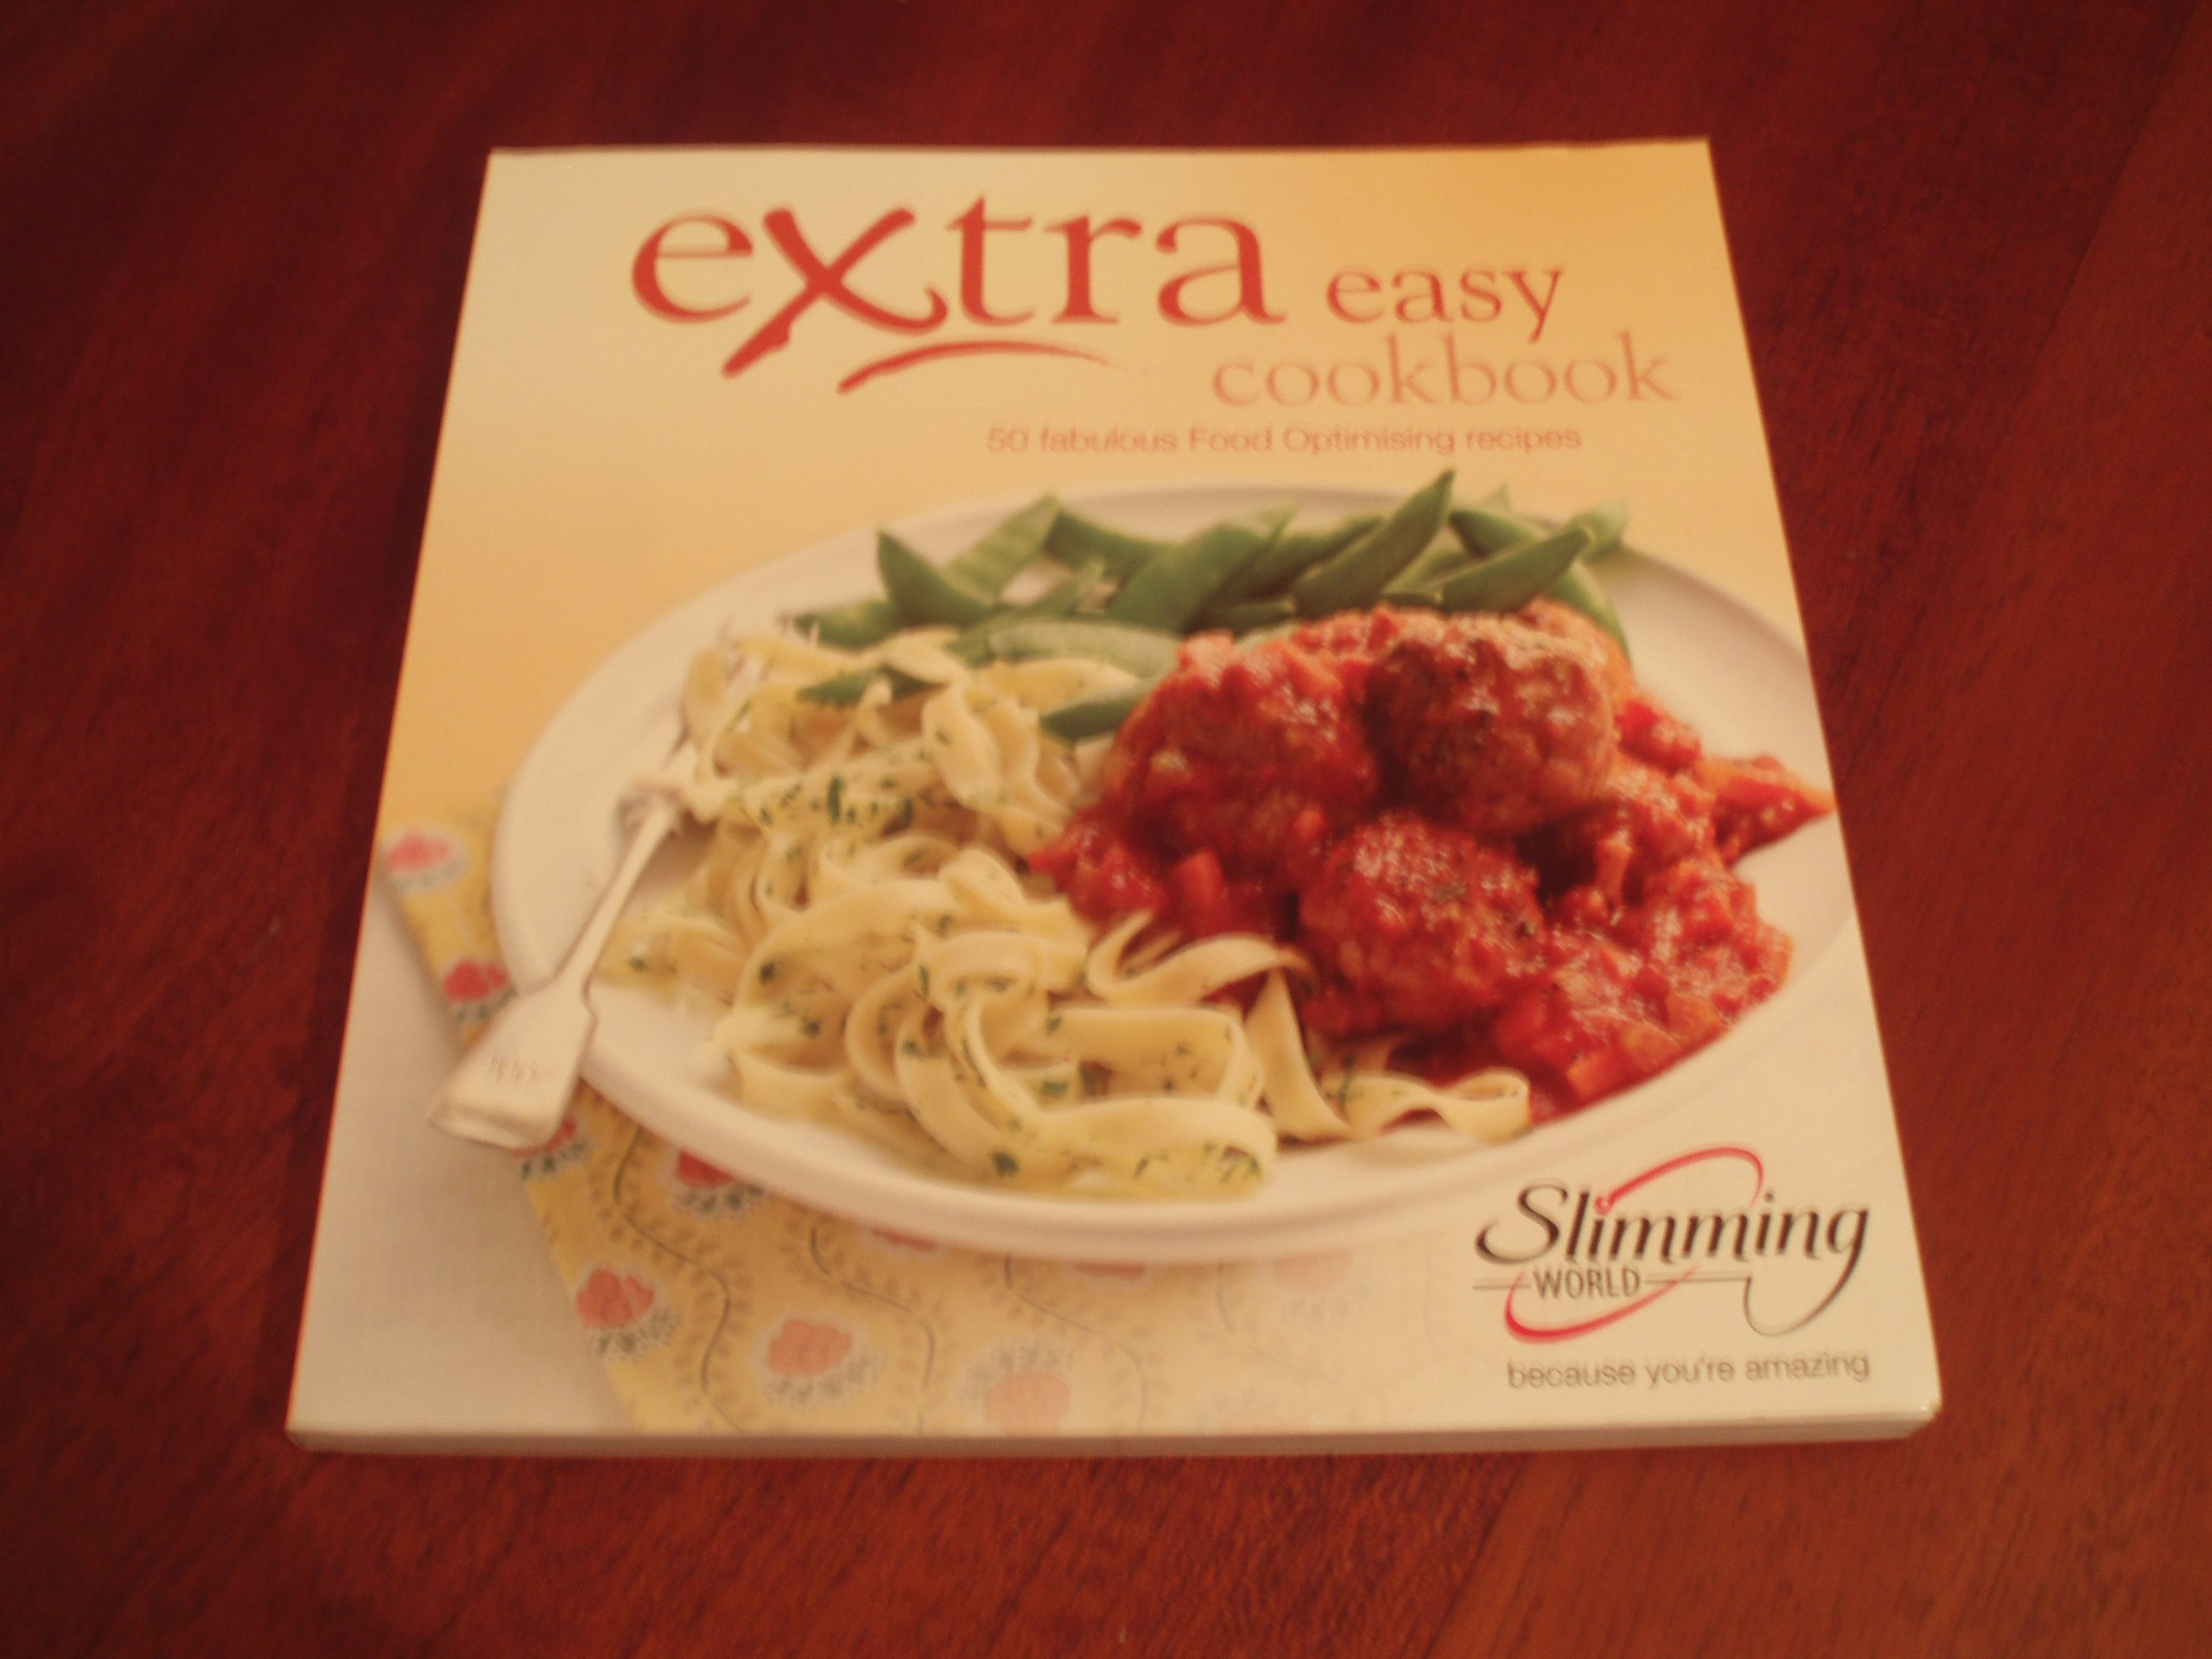 Slimming world extra easy cookbook amazon slimming world books forumfinder Choice Image